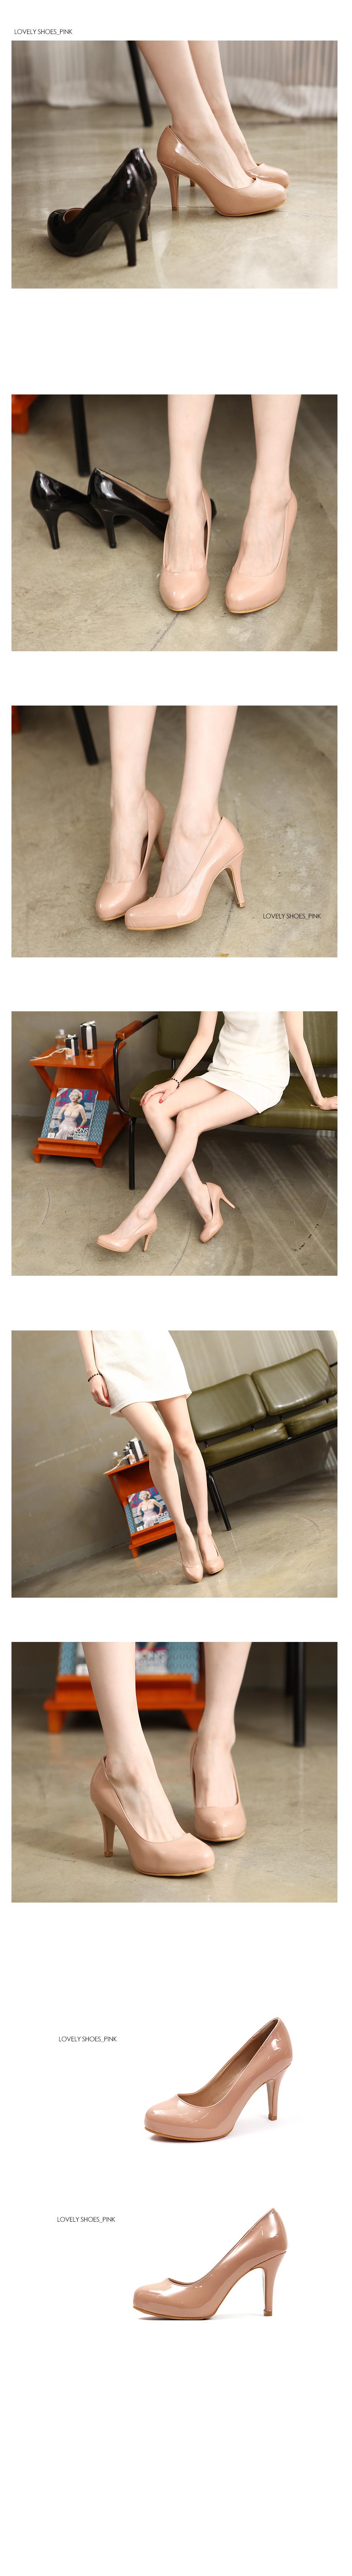 Tachia high heels 9 cm